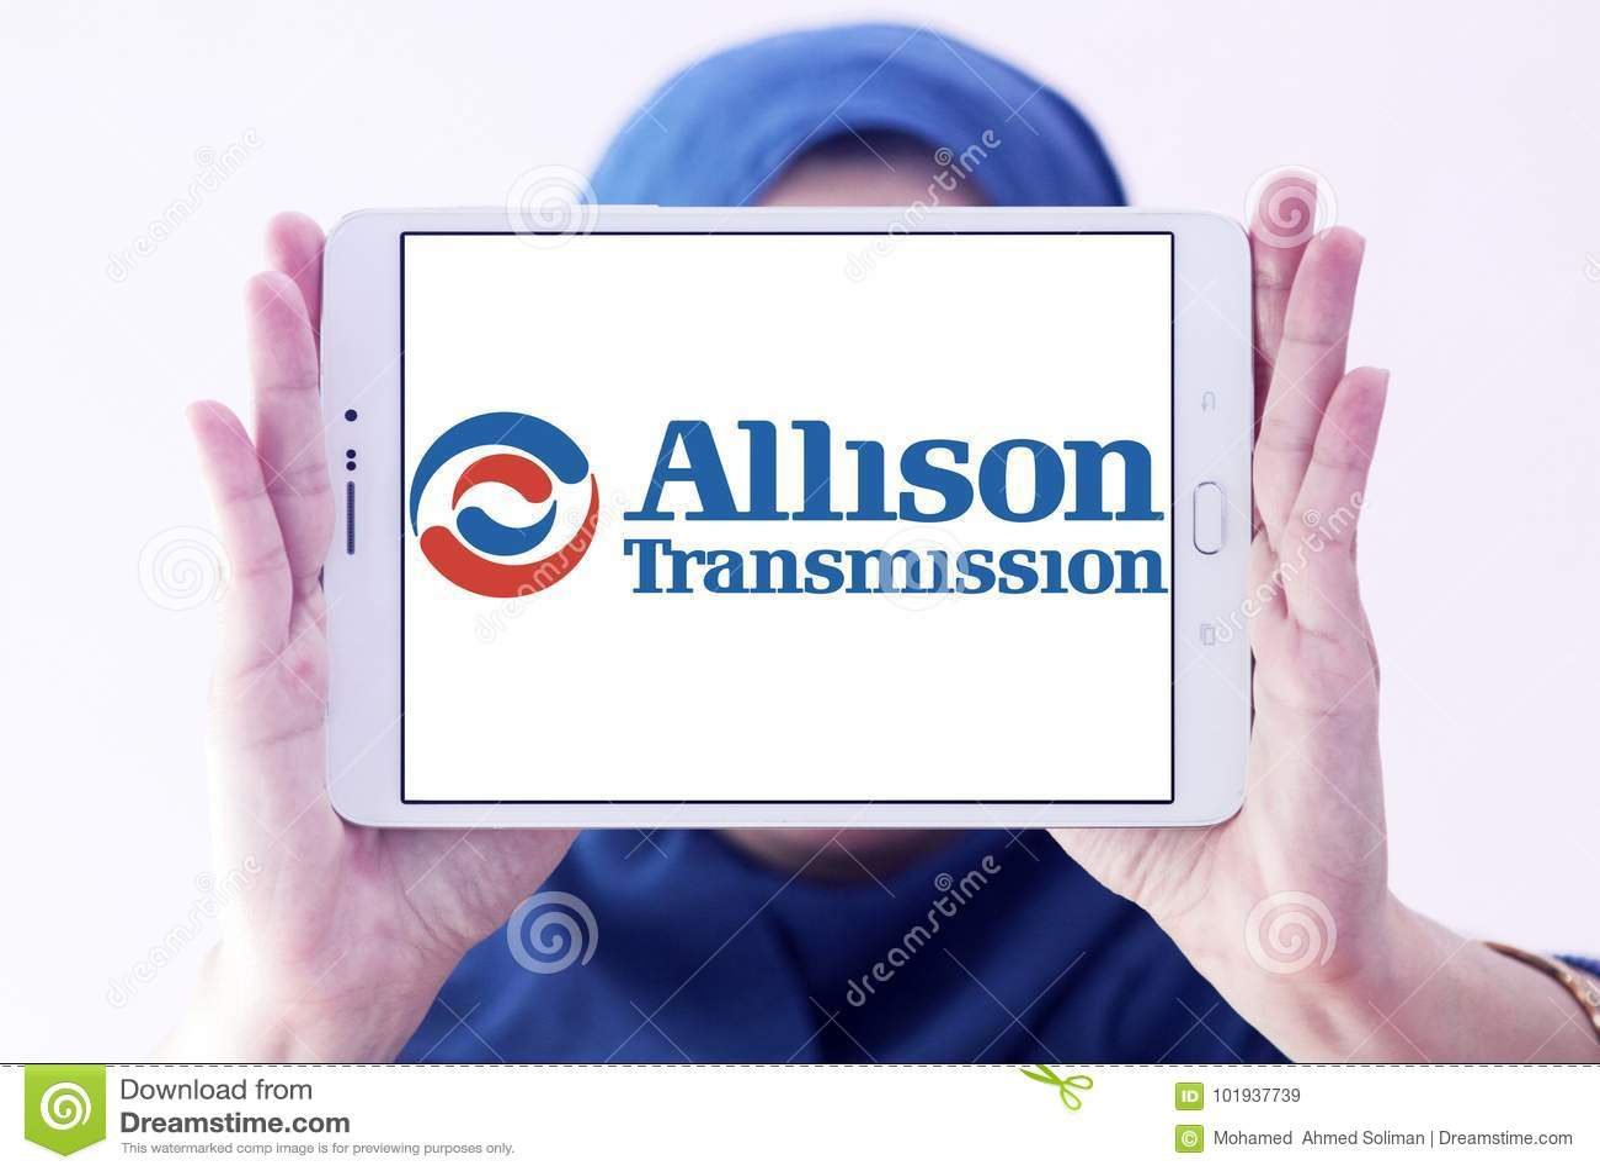 Allison Transmission Logo Editorial Stock Image Image Of Muslim 101937739